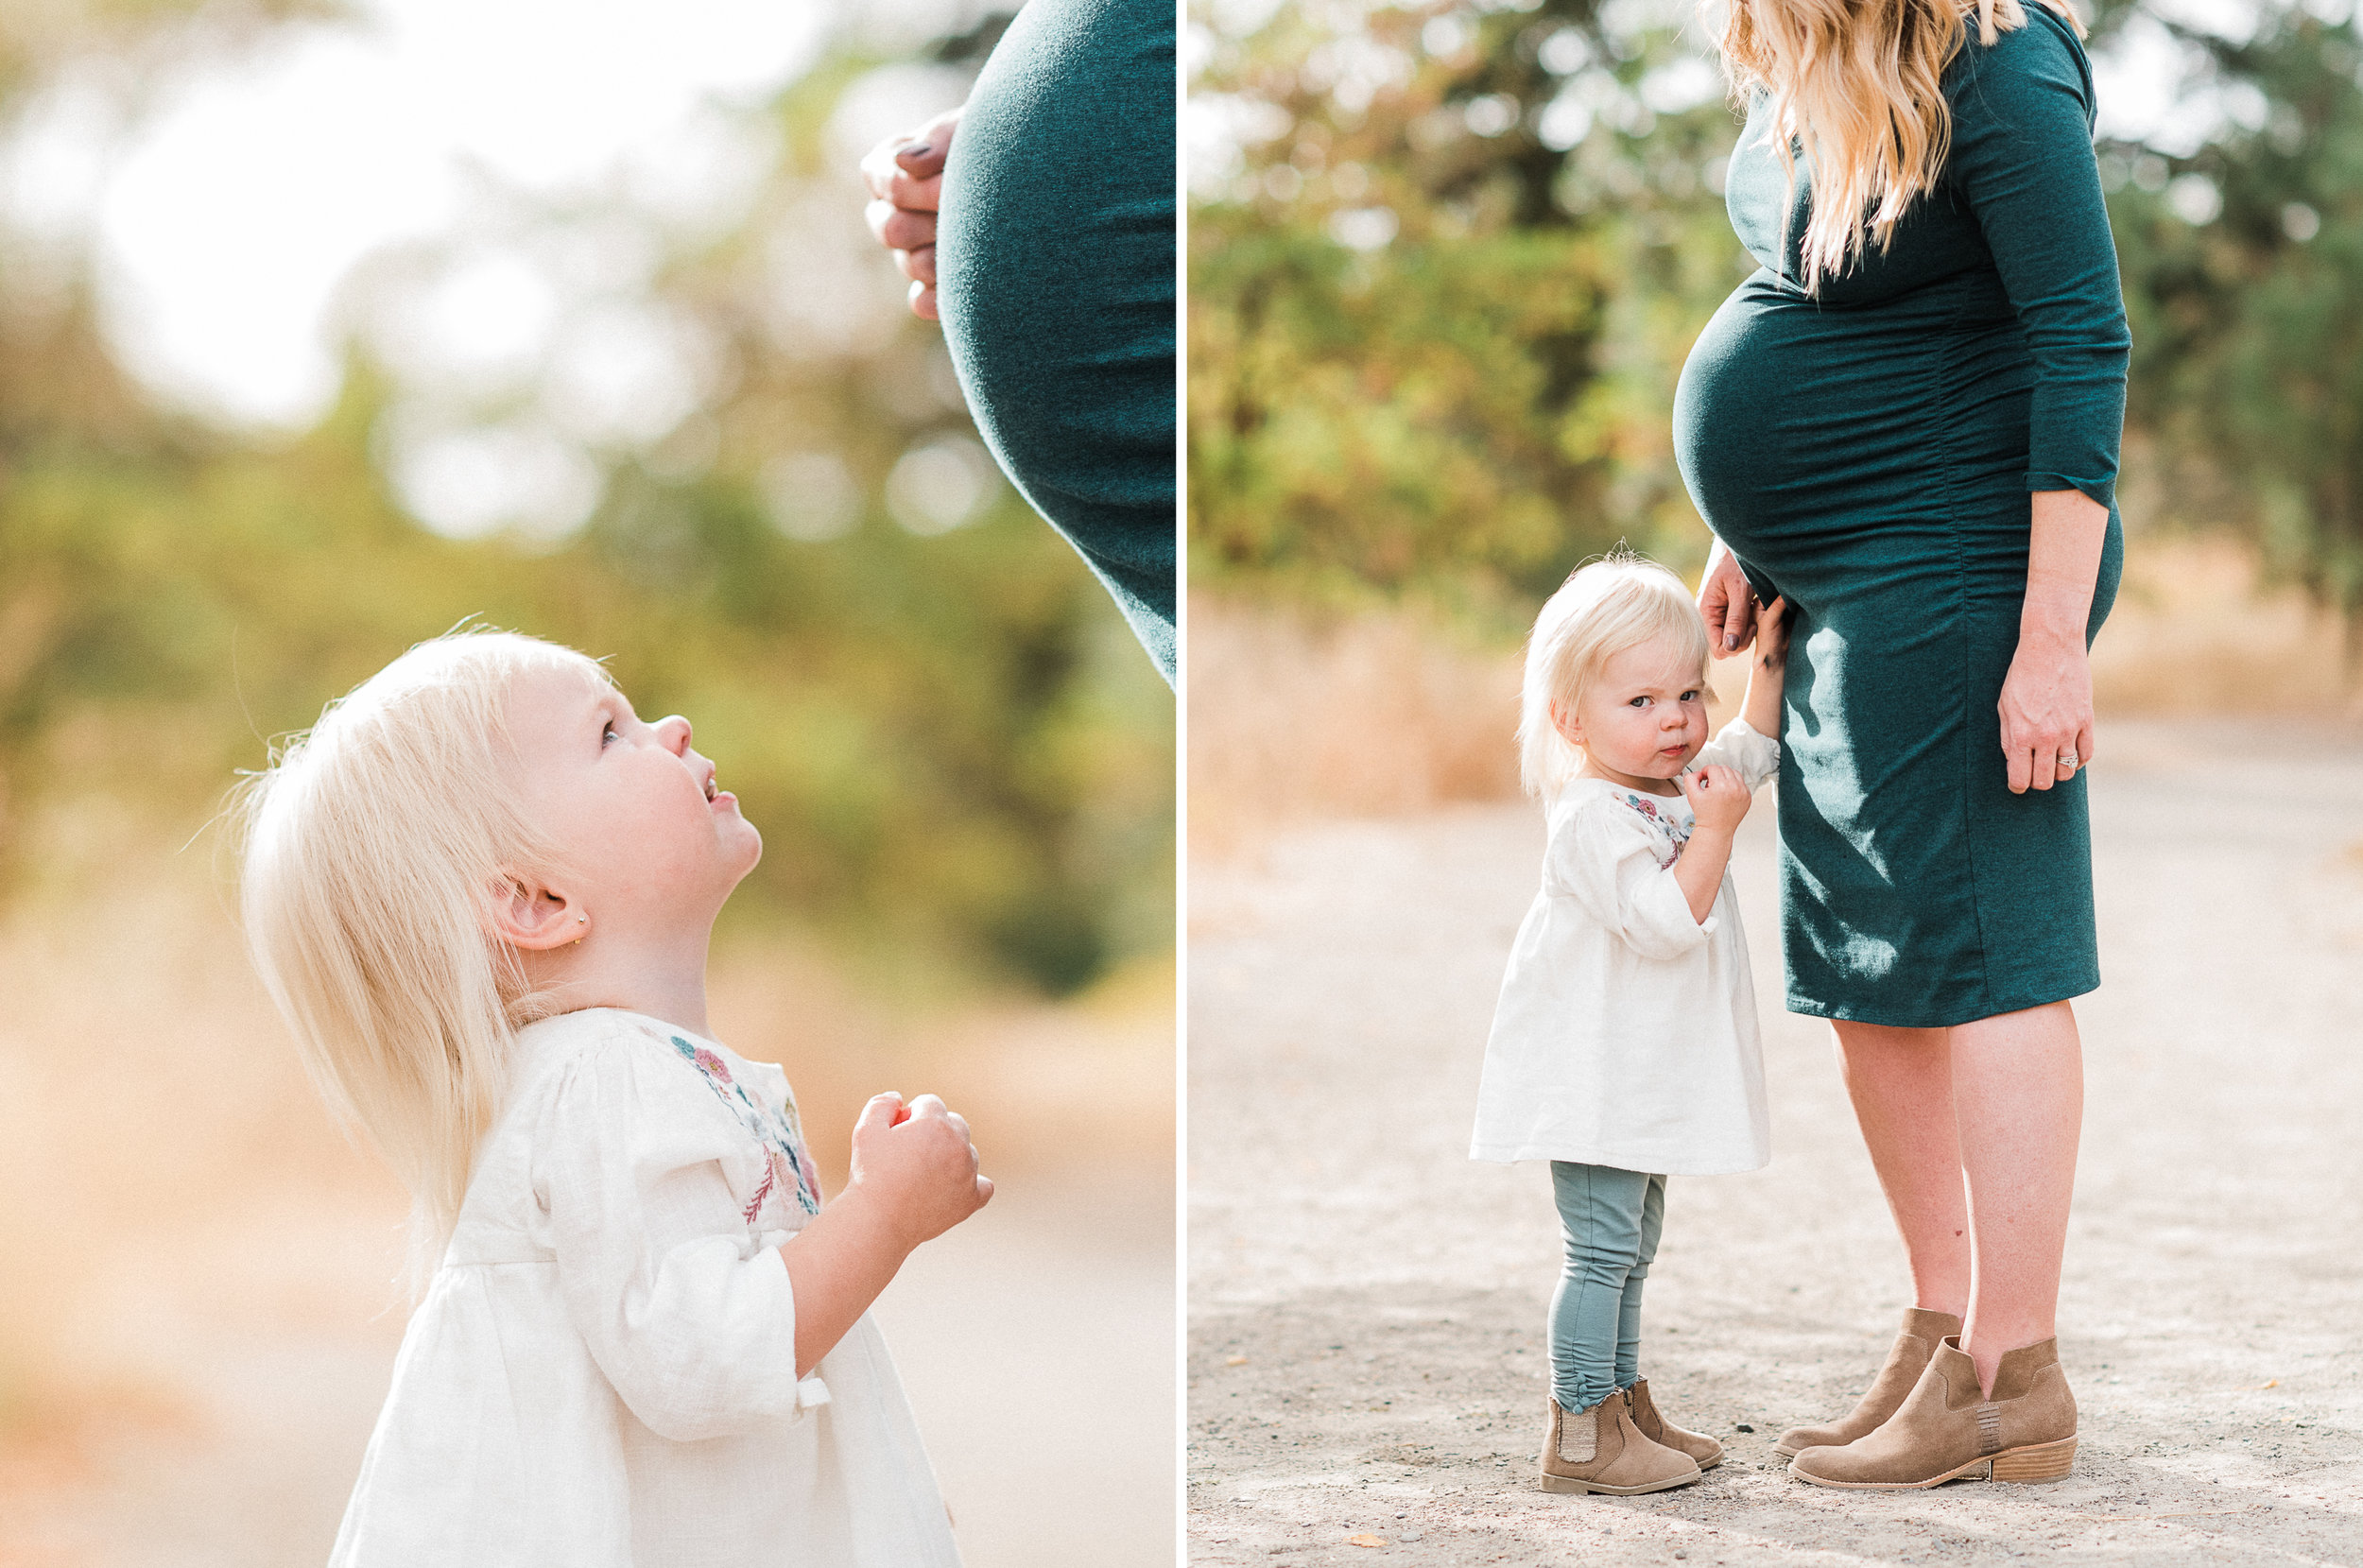 spokane_fall_maternity_session_17.jpg